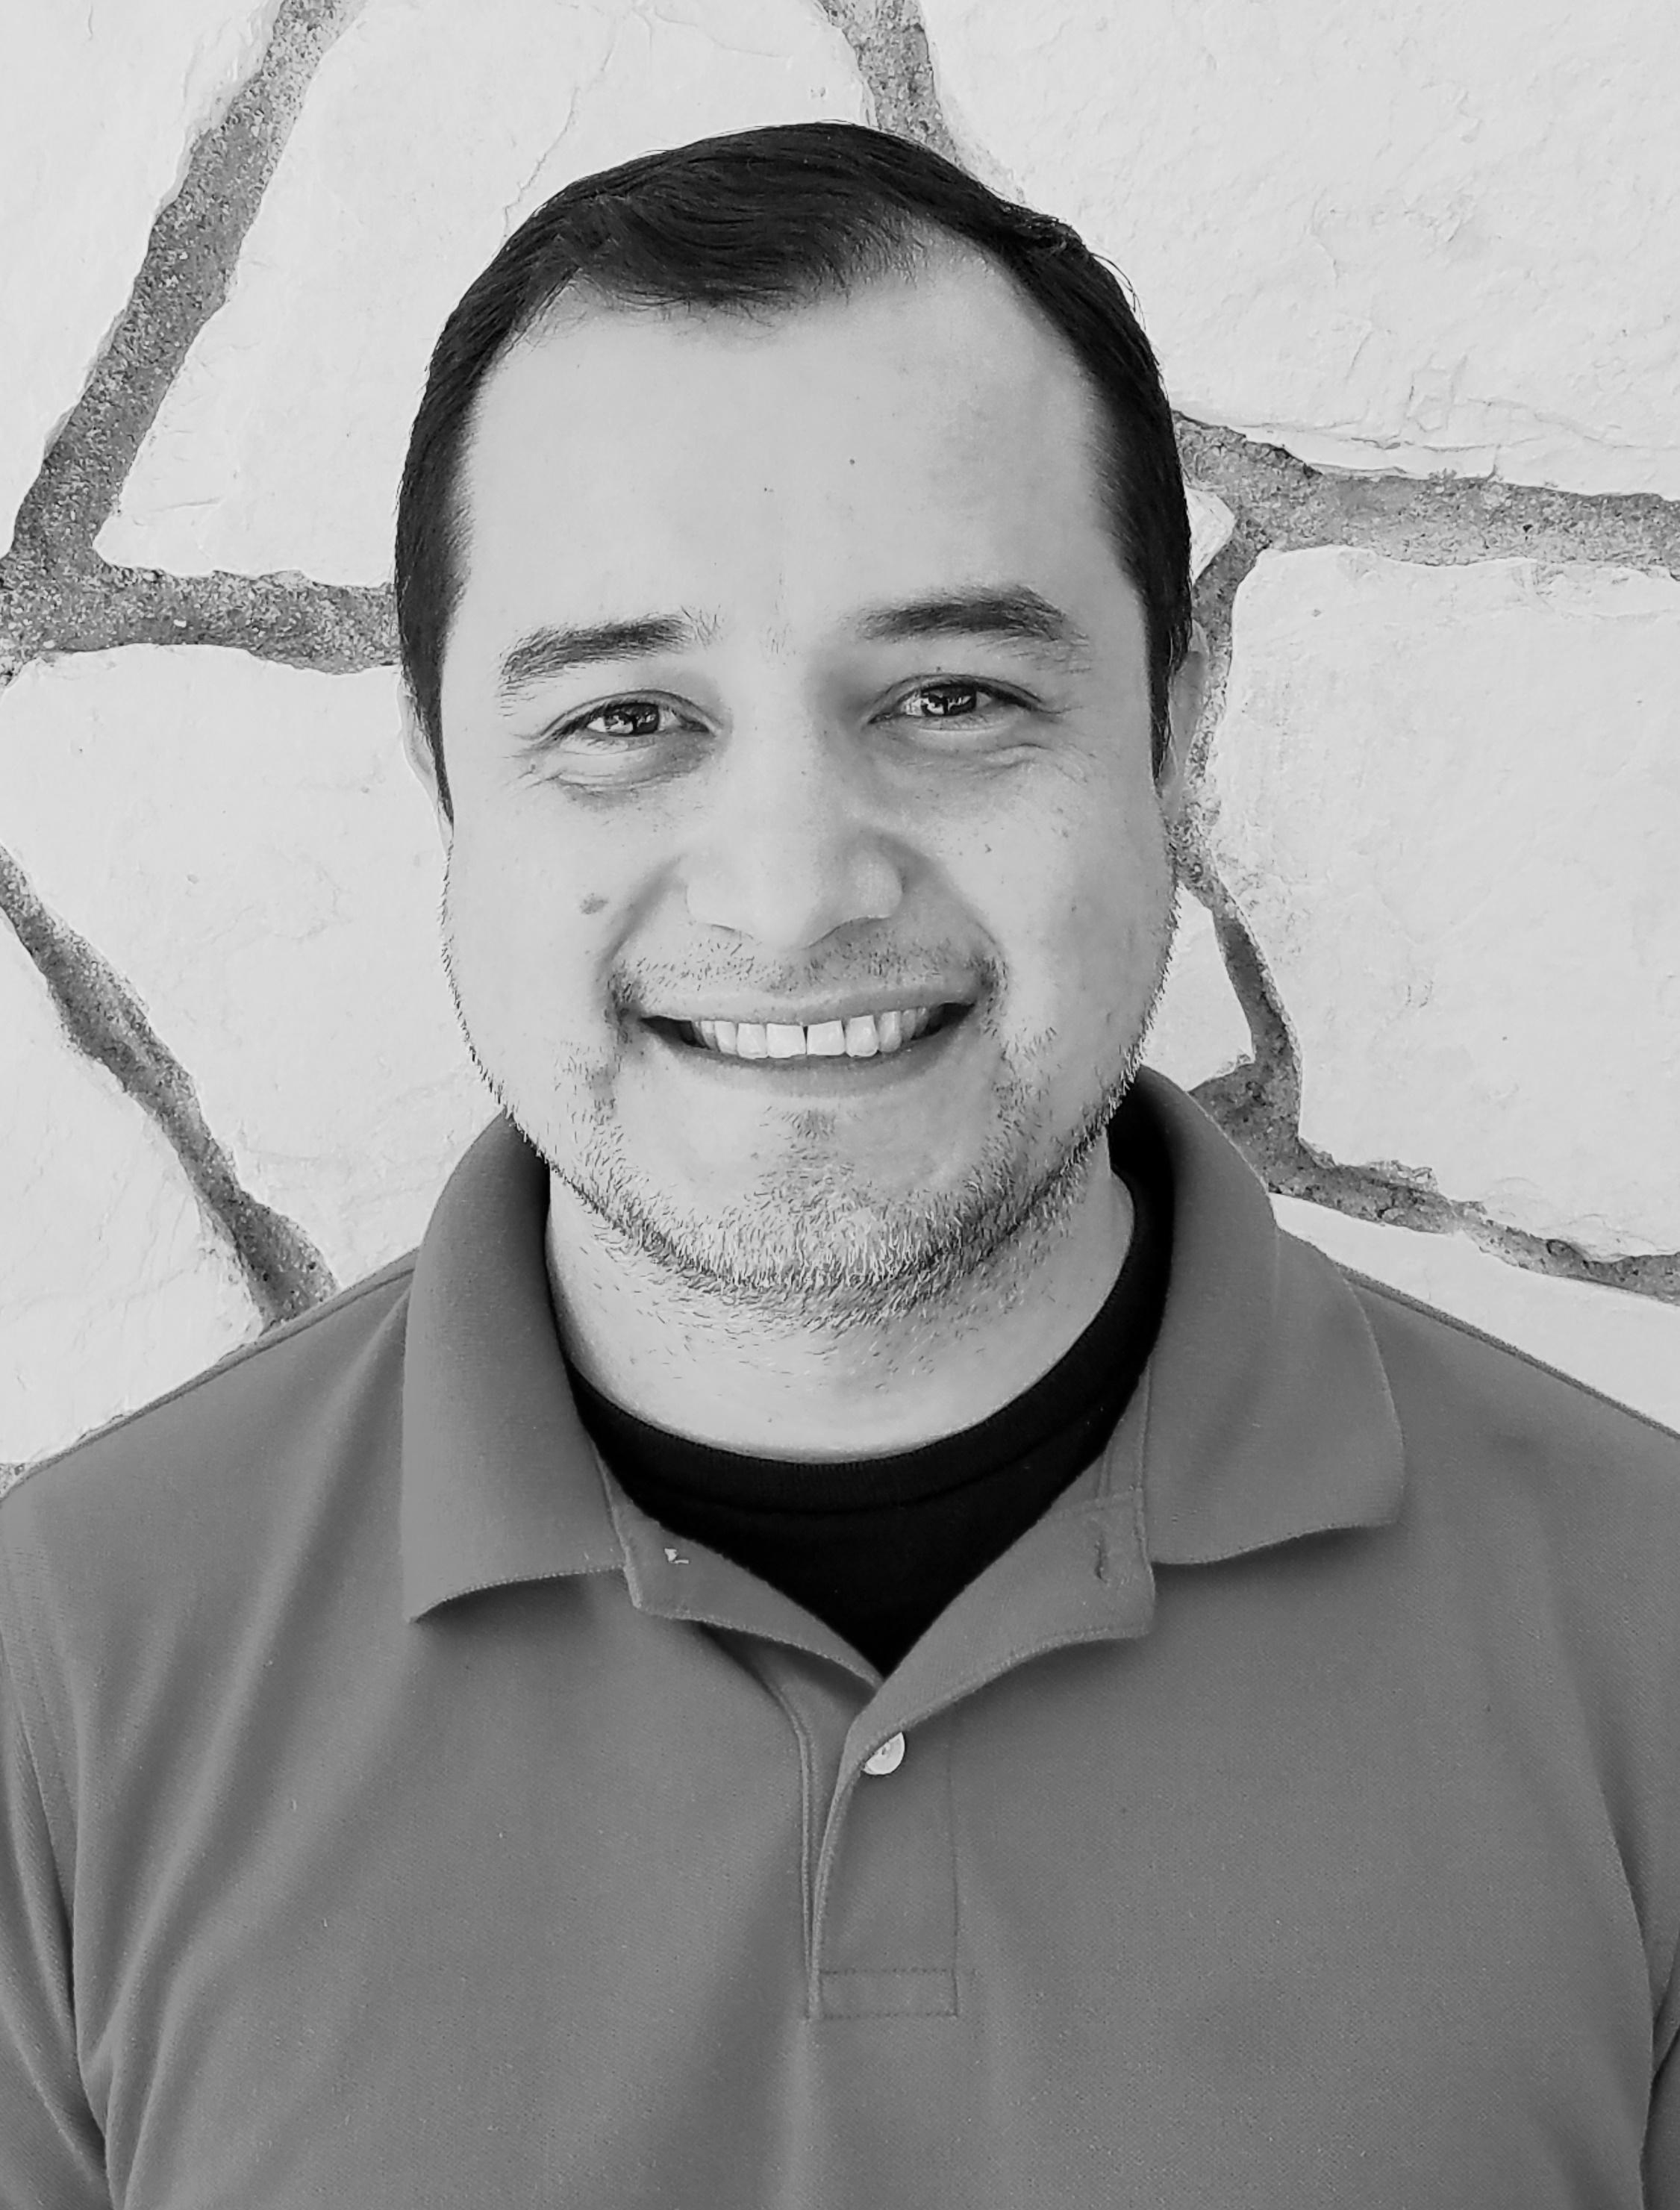 Daniel Jimenez - Facilities Custodian